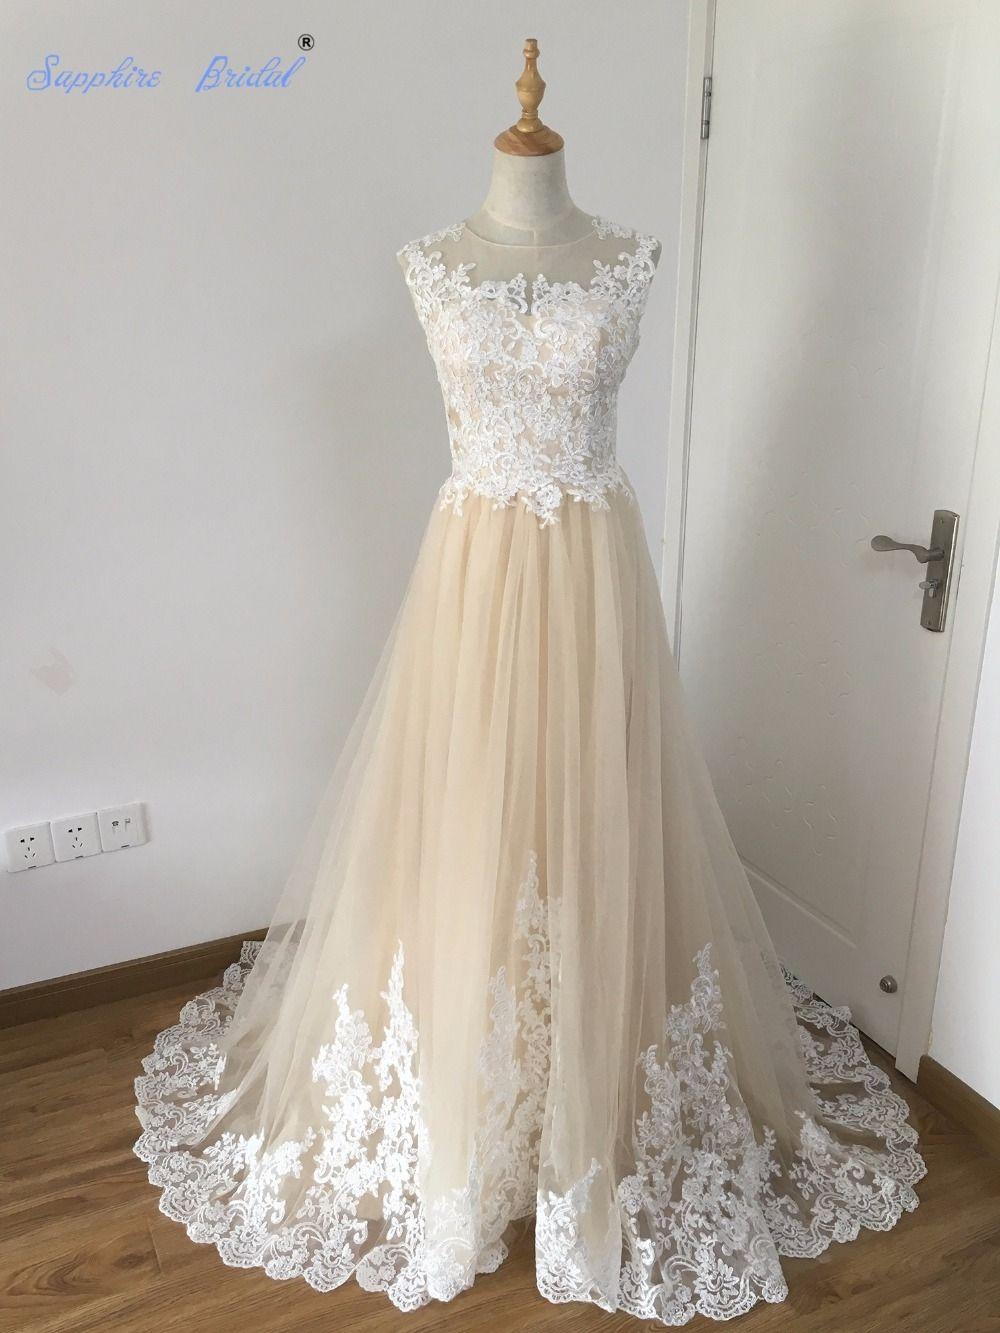 Lace wedding dress champagne  Sapphire Bridal  Real Photo Vestido De Noiva Champagne White